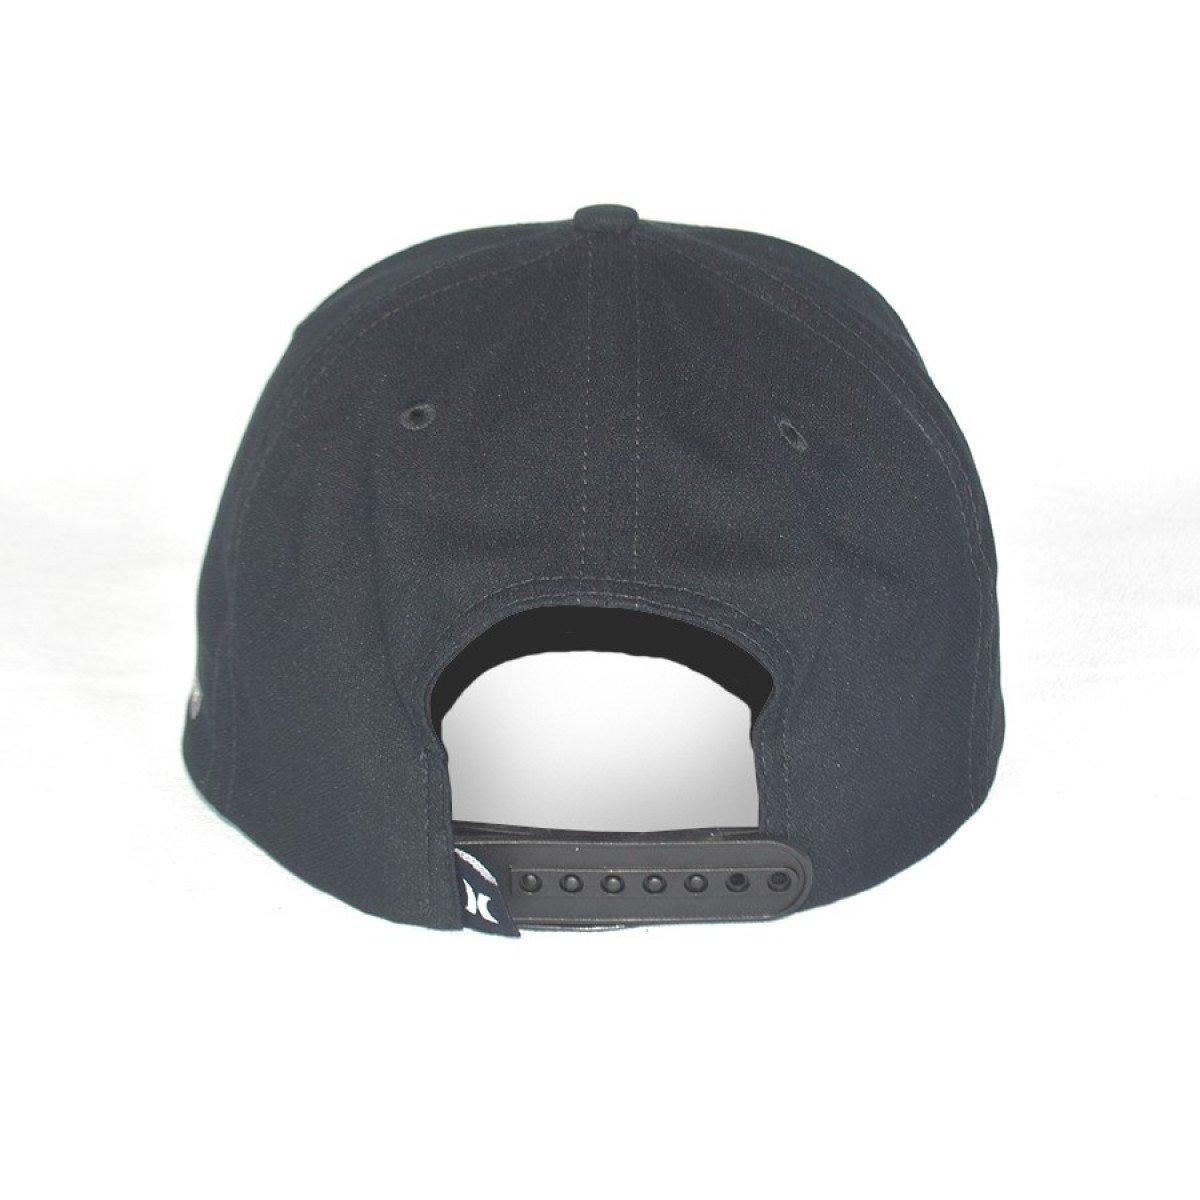 166fd5f9bd5c3 Boné Masculino Hurley Snapback Mini Cinza - Compre Agora